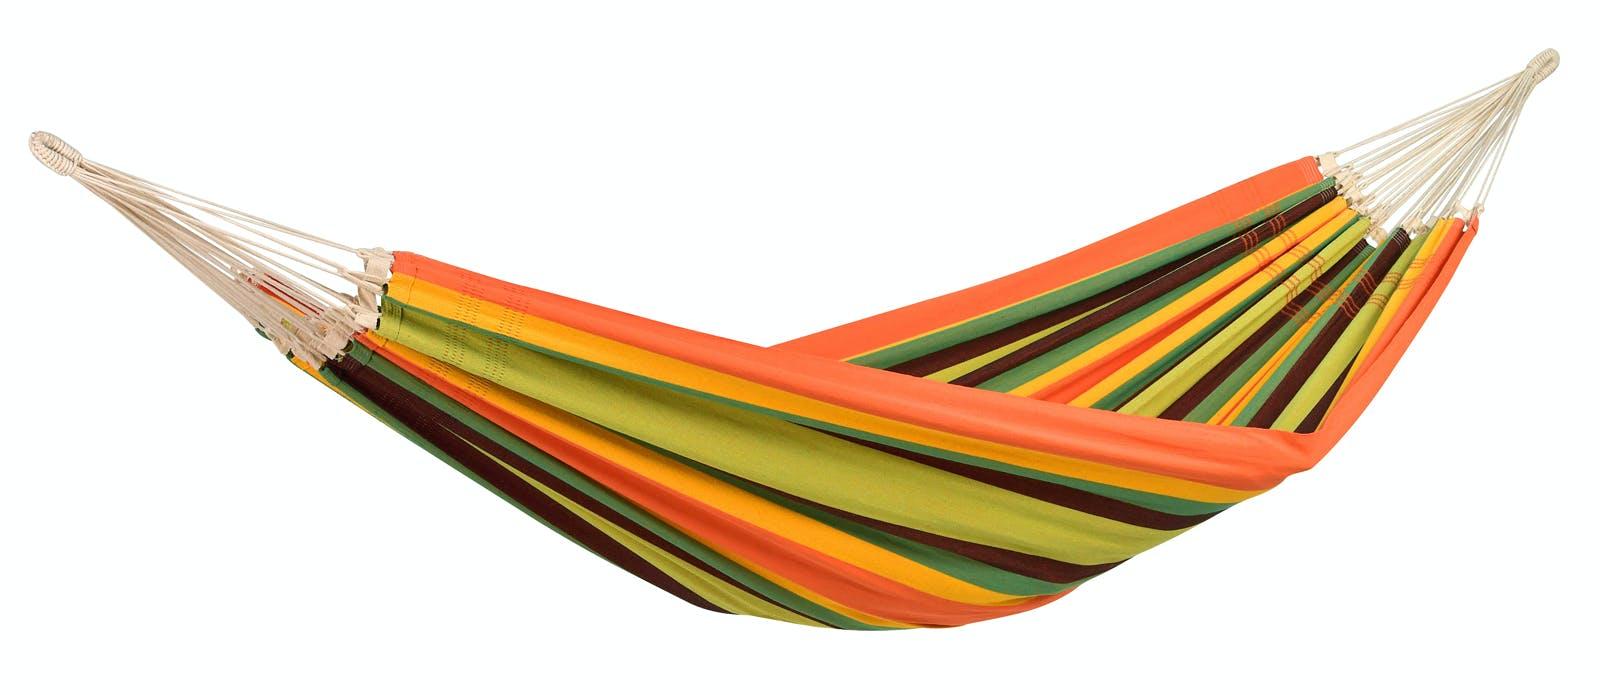 Hamac de jardin Paradiso Esmeralda vert orange jaune XXL 250x175cm AMAZONAS